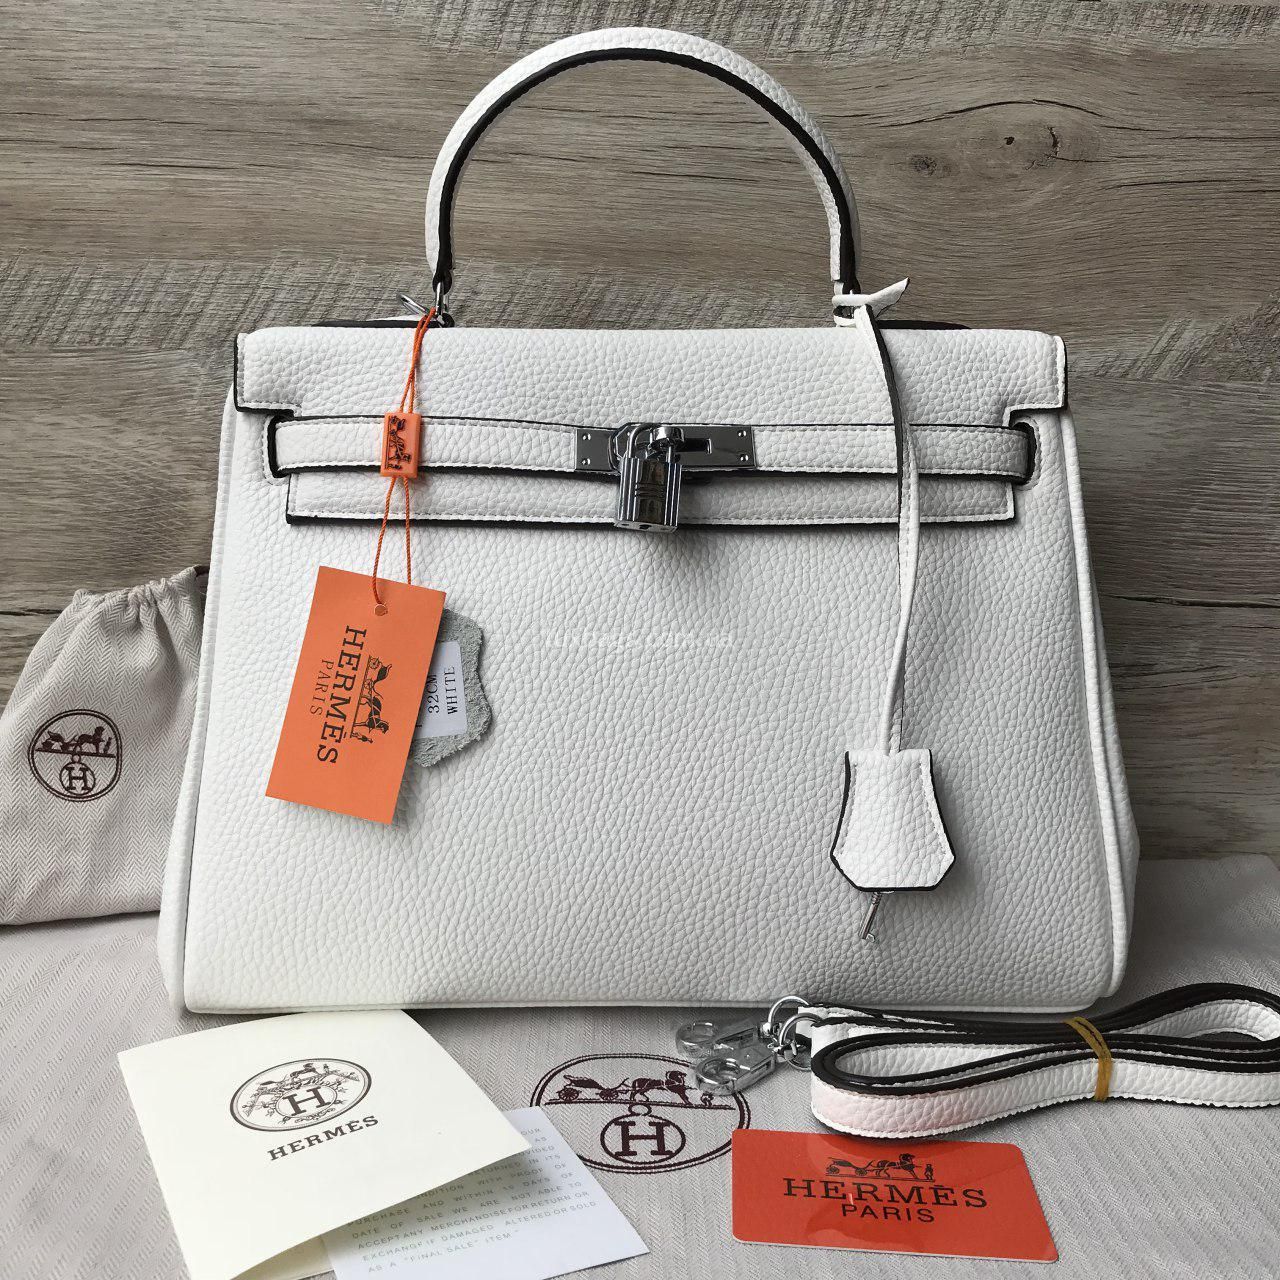 589fb4b085d9 Женская сумка Hermes Kelly (Гермес Келли)   lux-bags